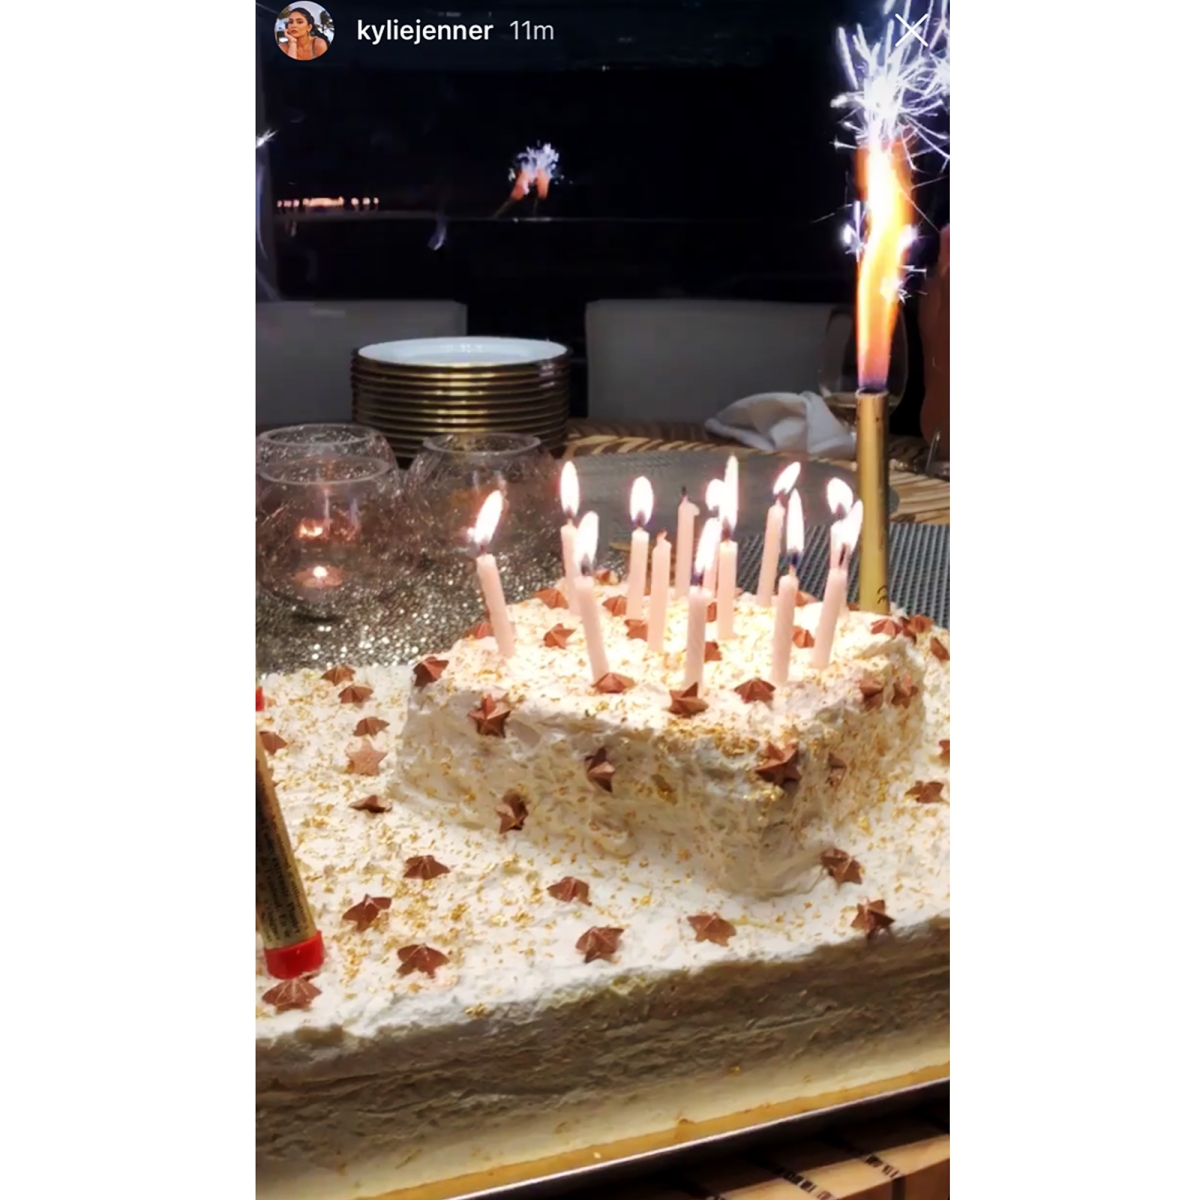 Surprising See The Kardashian Familys Best Cakes Photos Funny Birthday Cards Online Fluifree Goldxyz